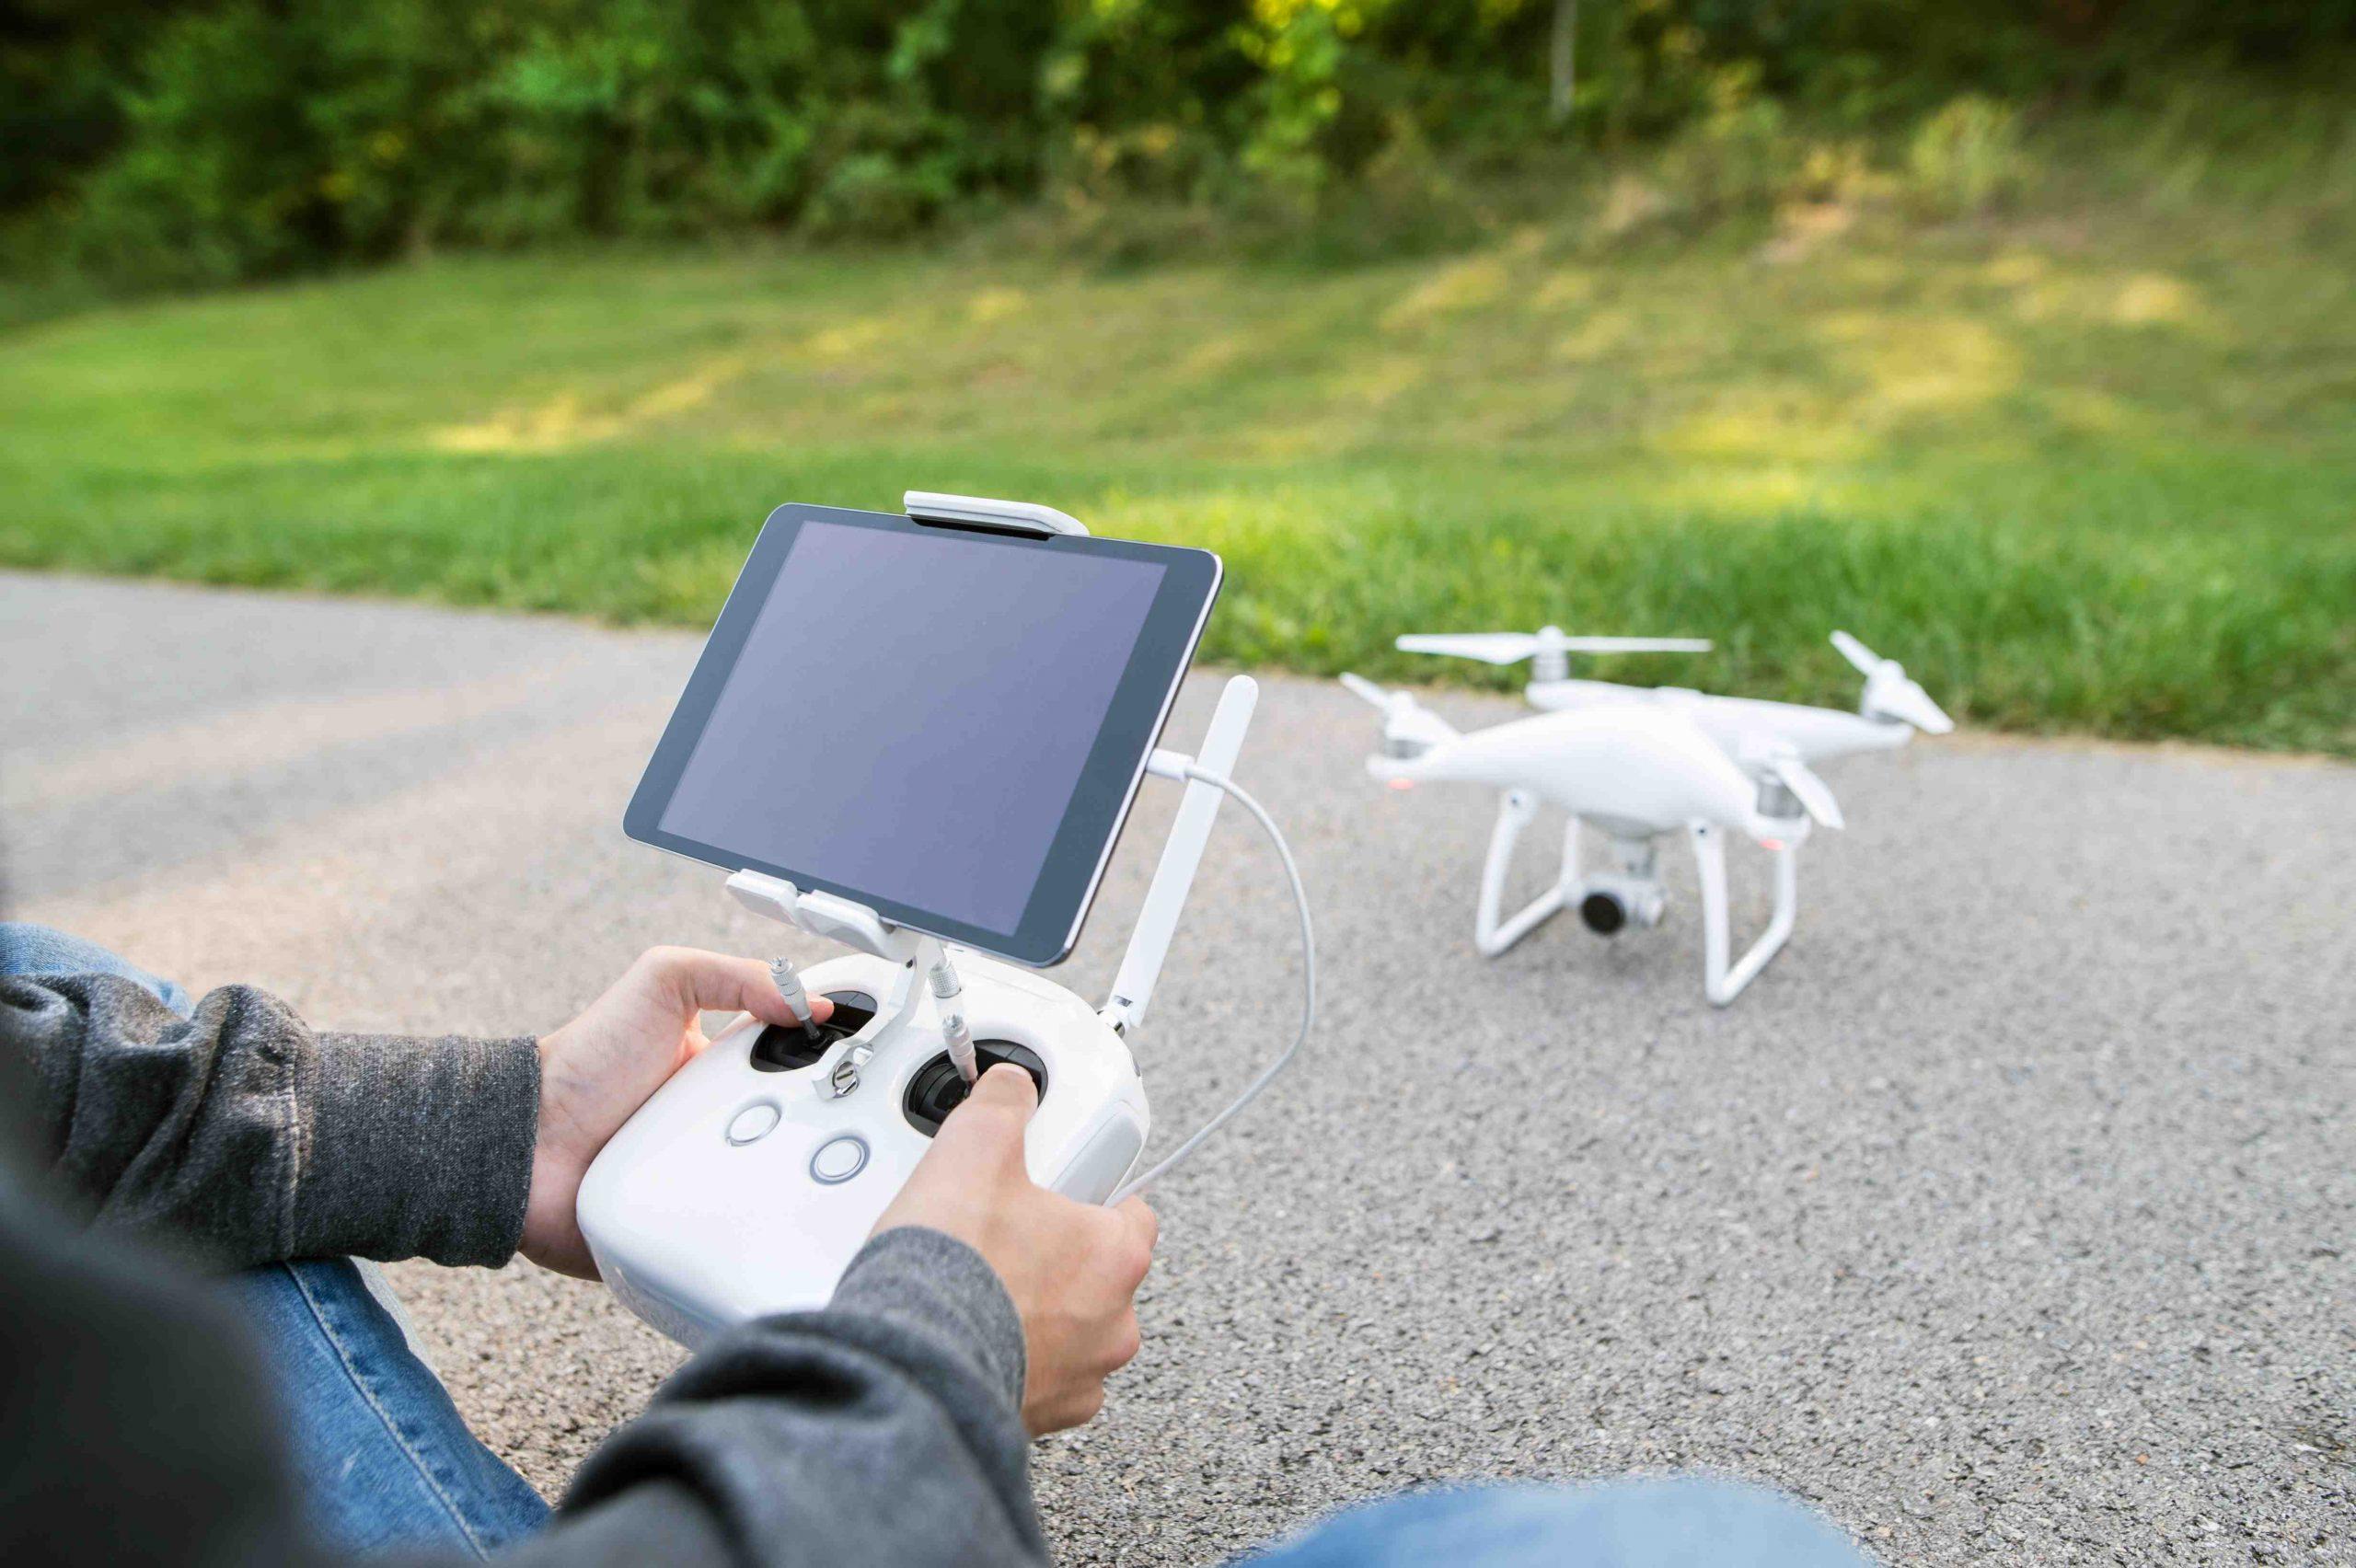 Aerial-Drone-Photography-huntington-beach-image